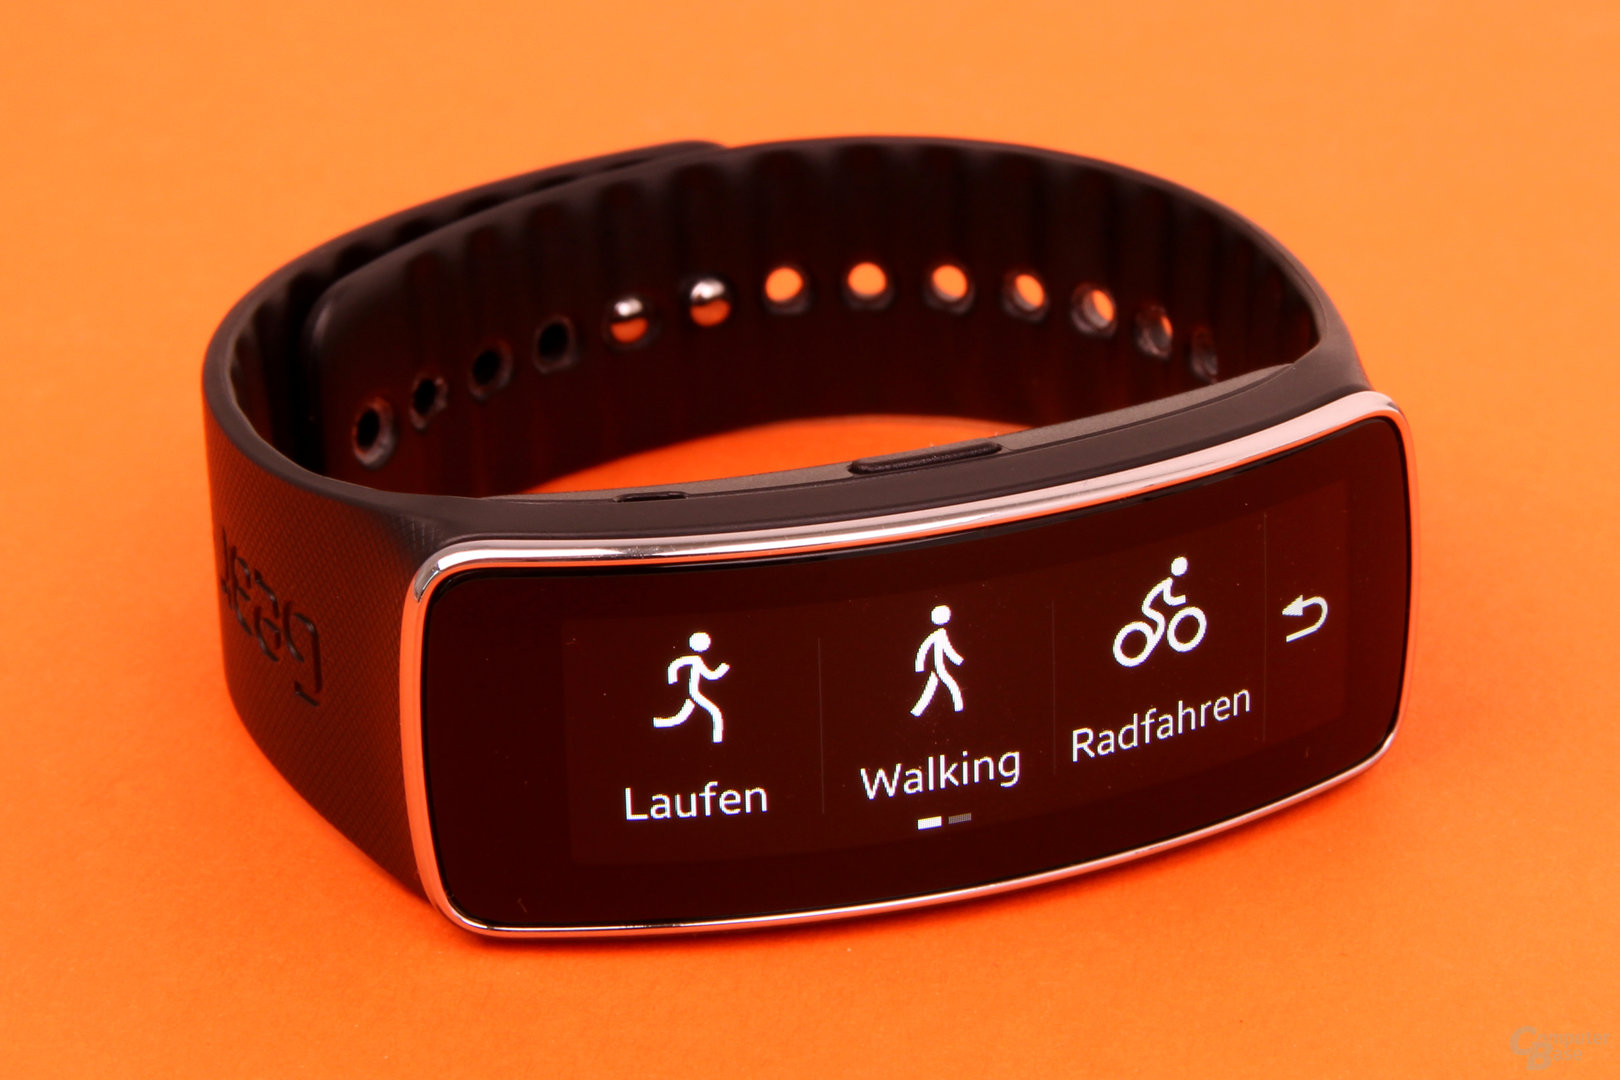 Trainingsmodi – Laufen, Walking, Radfahren, Wandern